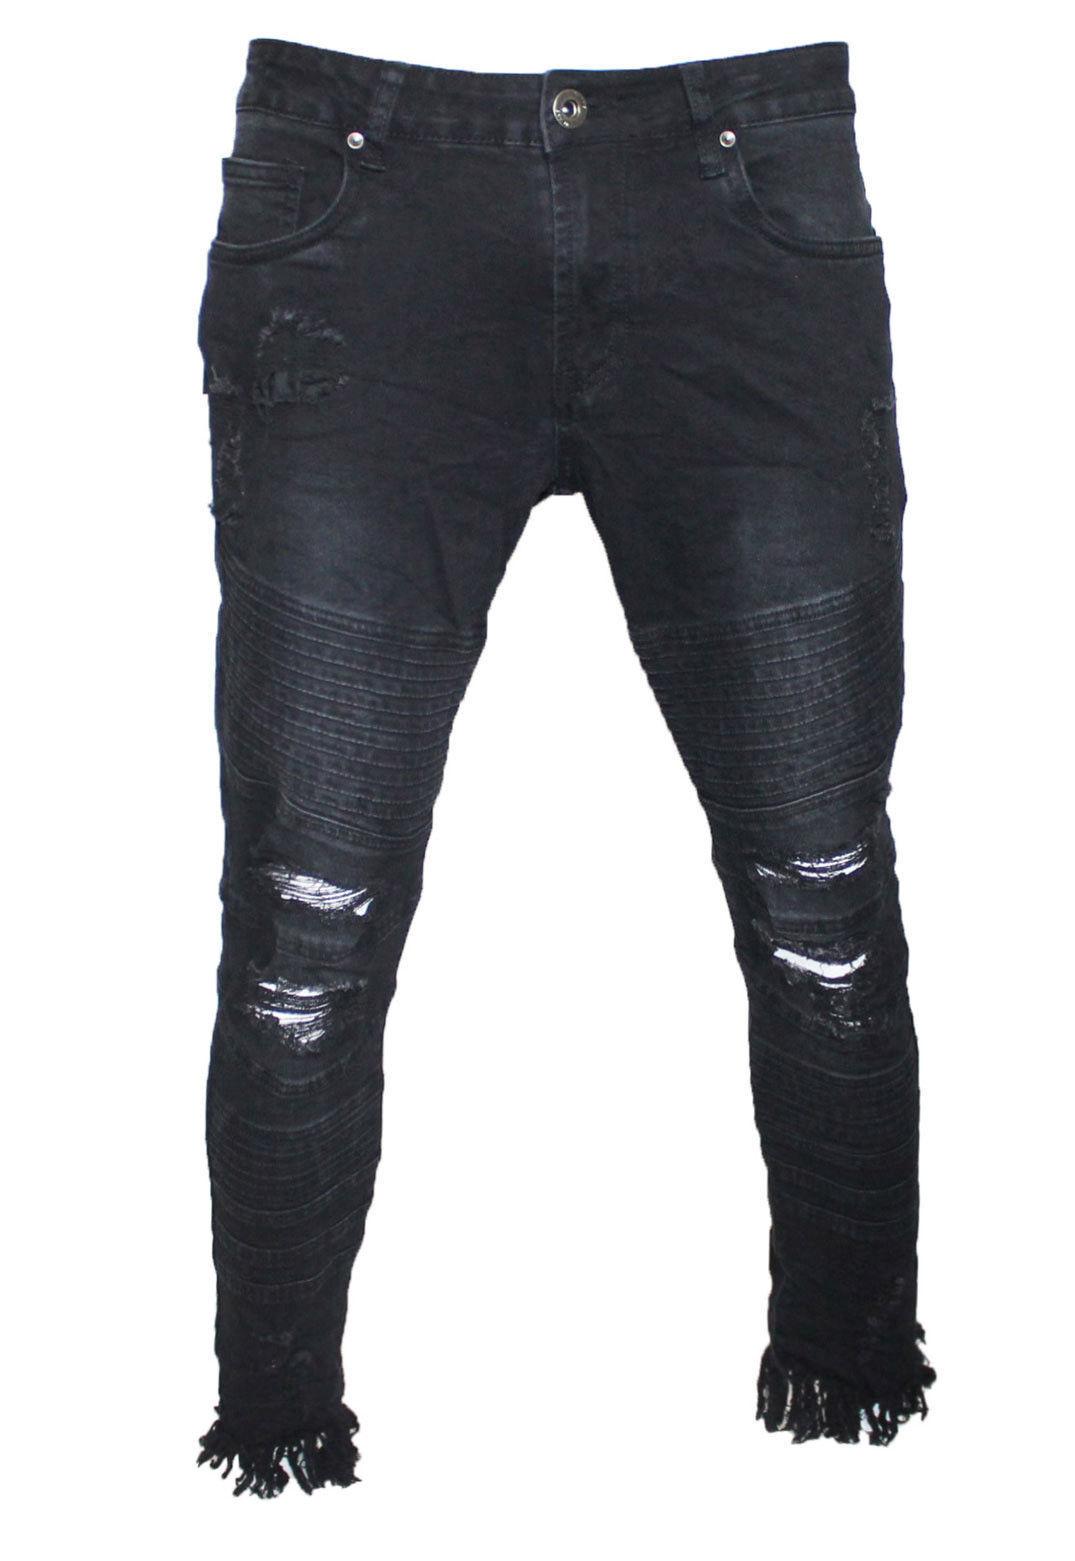 Jeans Skinny da Uomo Stretch Denim Fit Slim Tutte Le Taglie Vita Nuovi Pantaloni POW 423